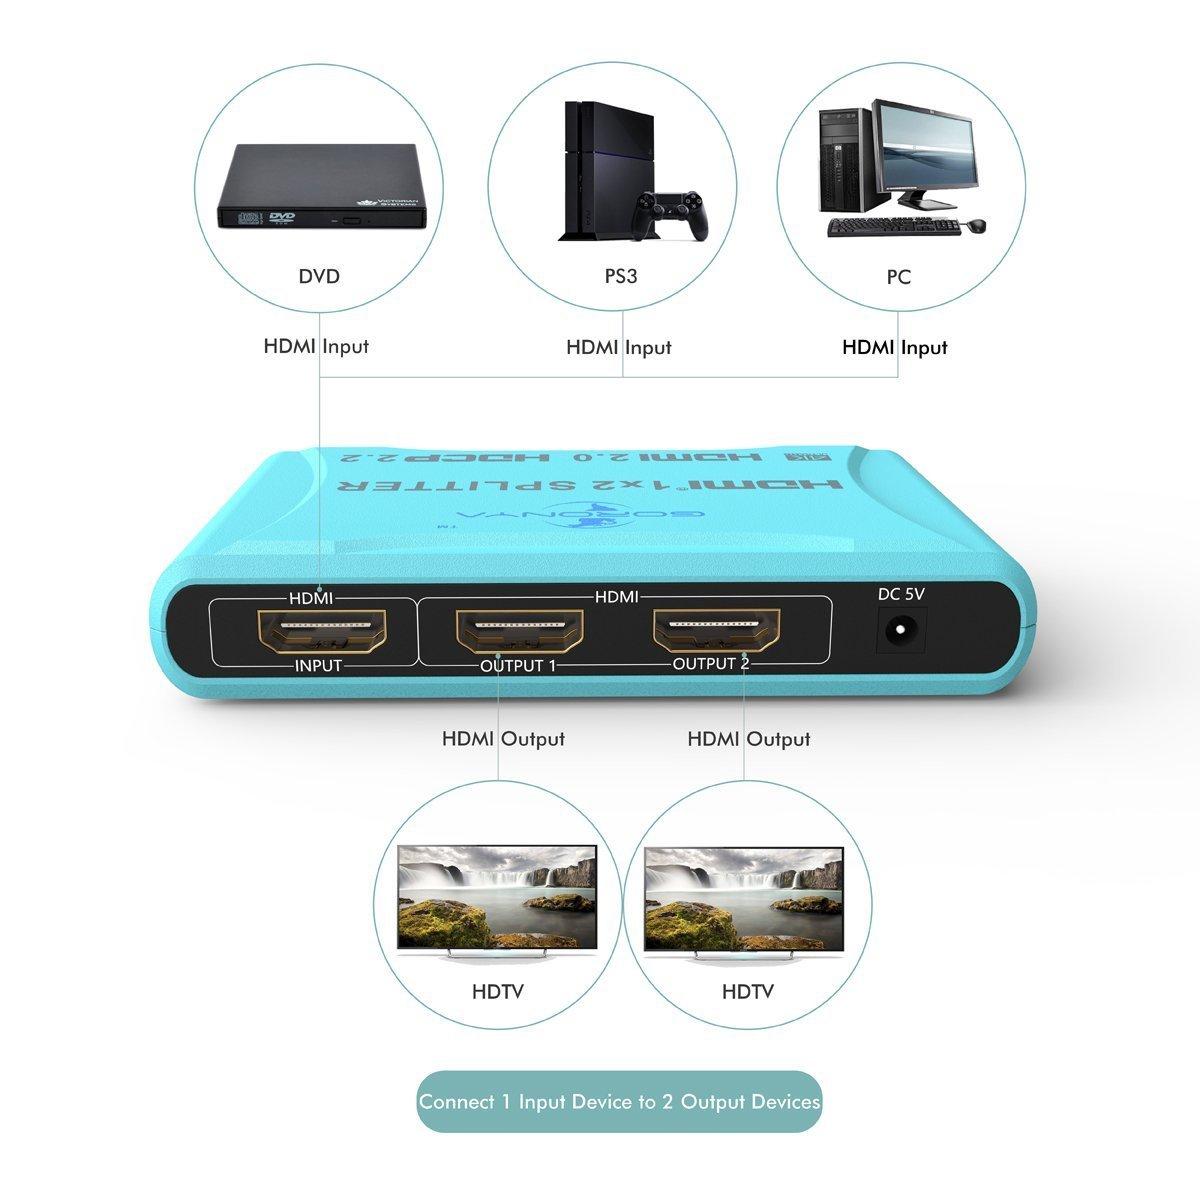 Amazon.com: [TRUE 4K] Goronya 2 Port HDMI to HDMI Splitter with HDMI ...